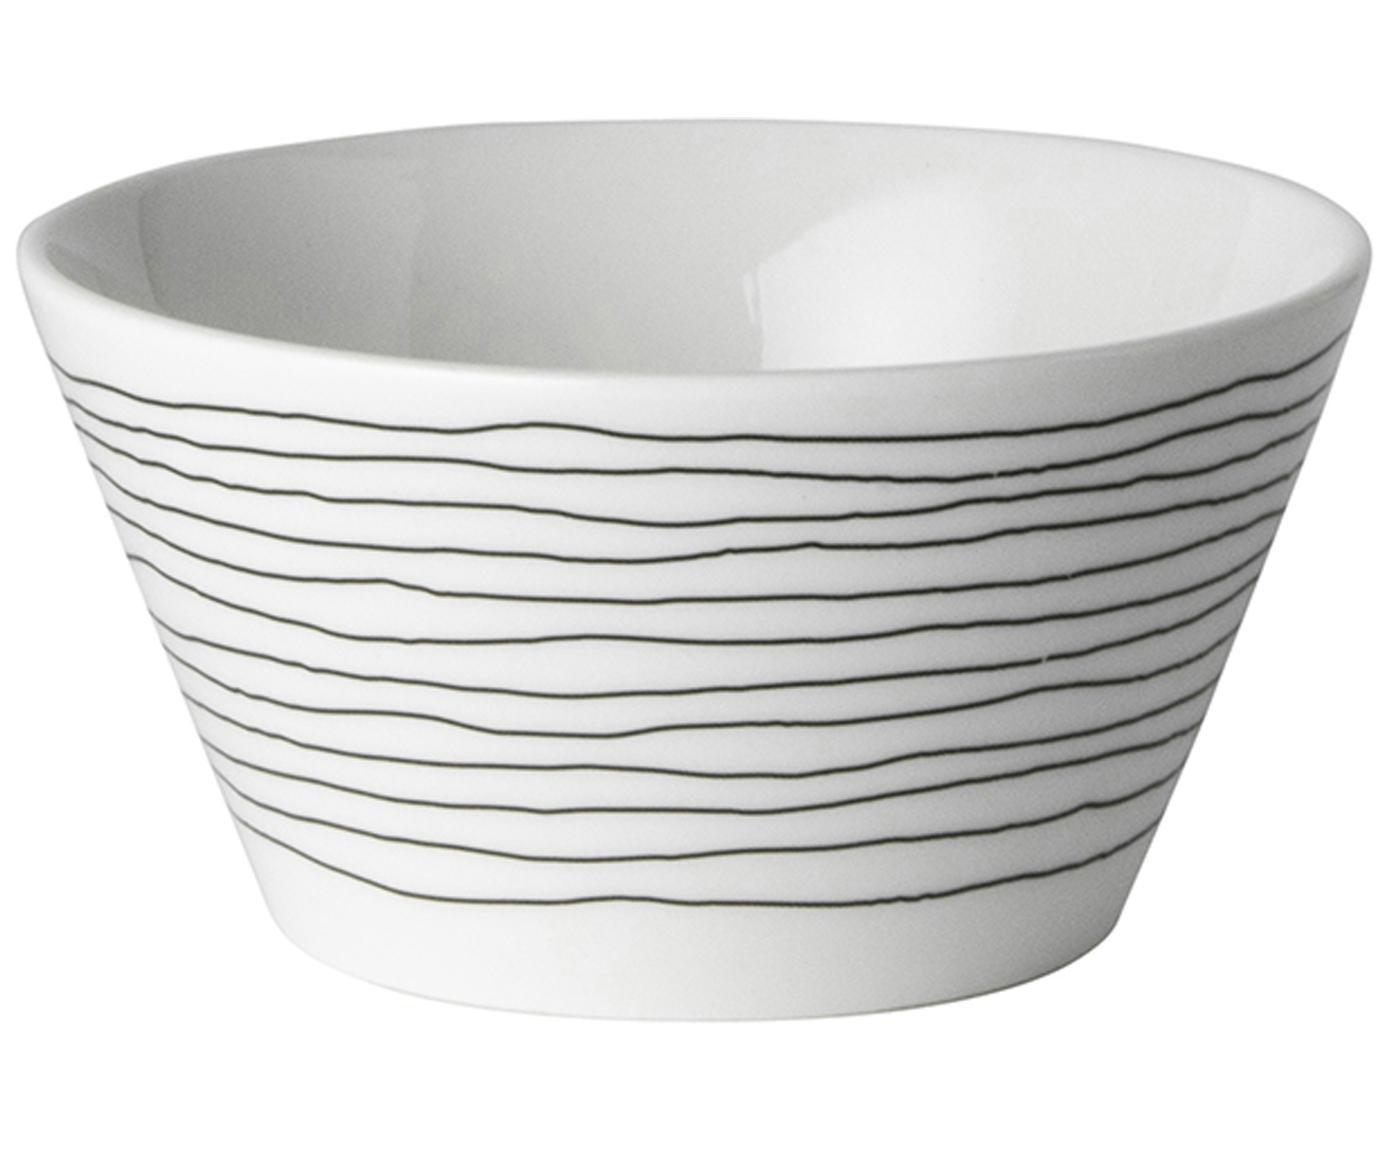 Miska Eris Loft, 4 szt., Porcelana, Biały, czarny, Ø 10 x W 6 cm